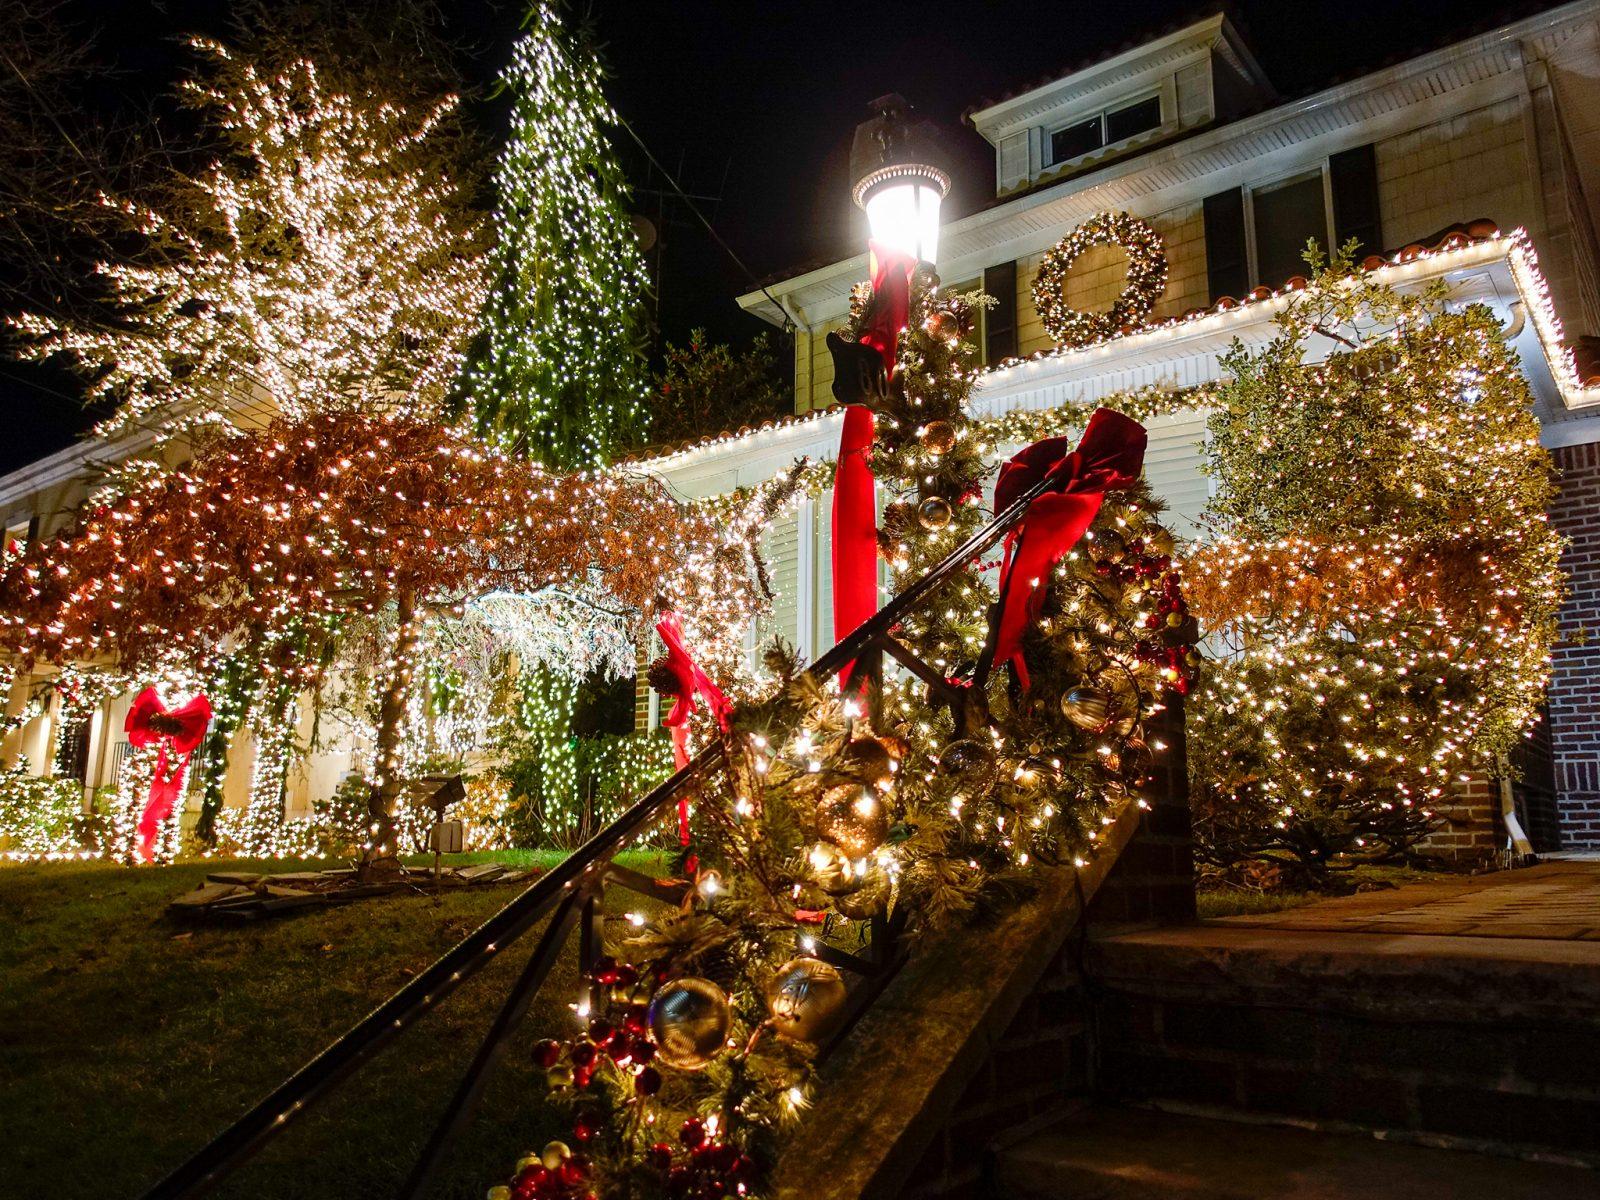 dekorert hus til jul